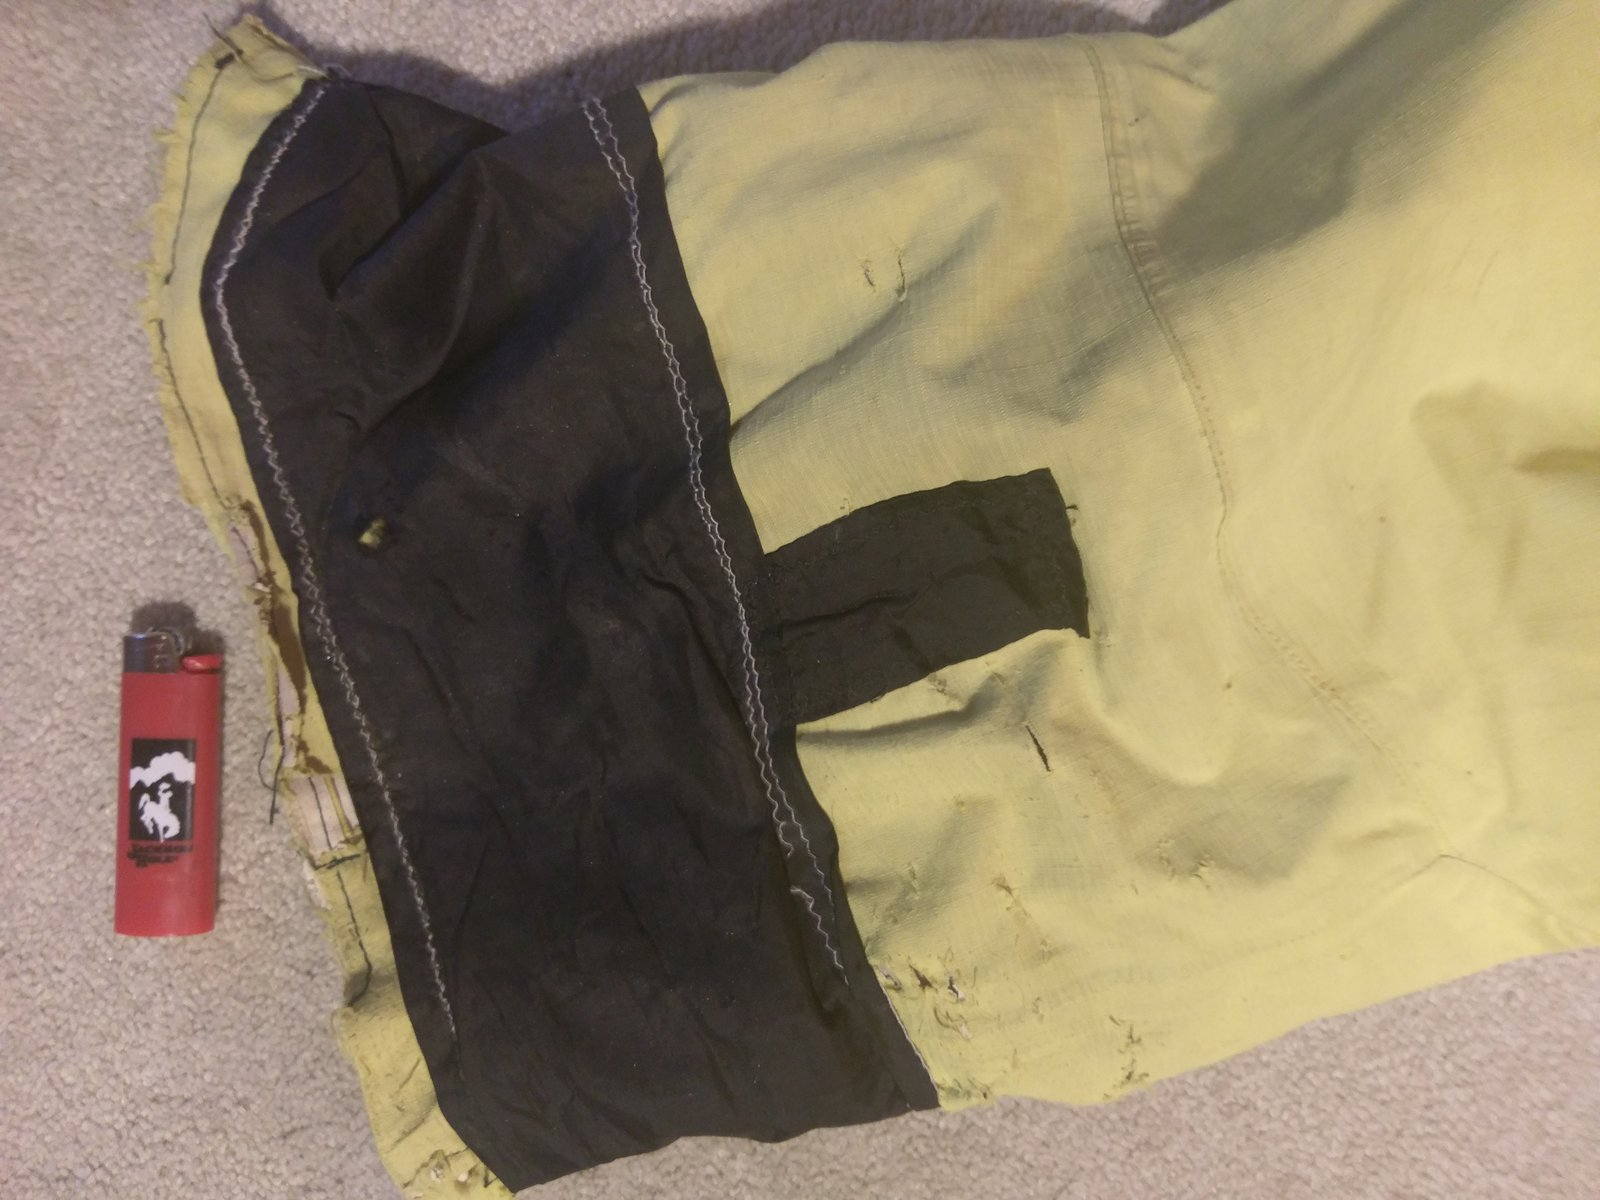 Oakley cuff damage left leg